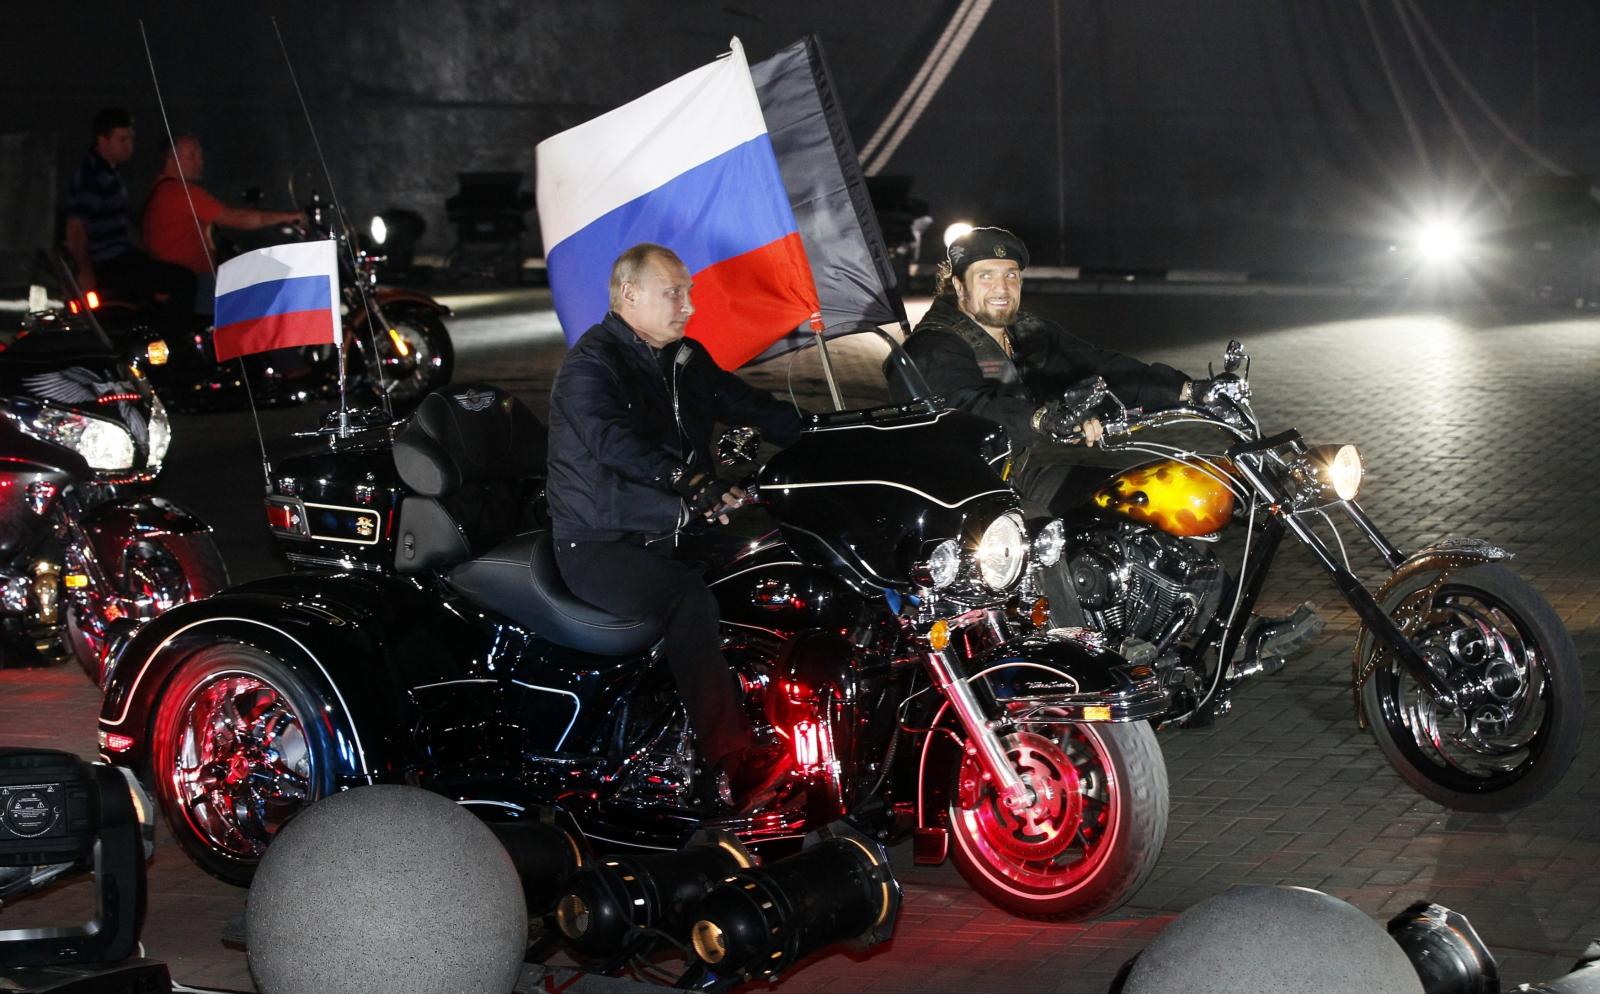 gang biker putin bikers wolves night angels kremlin